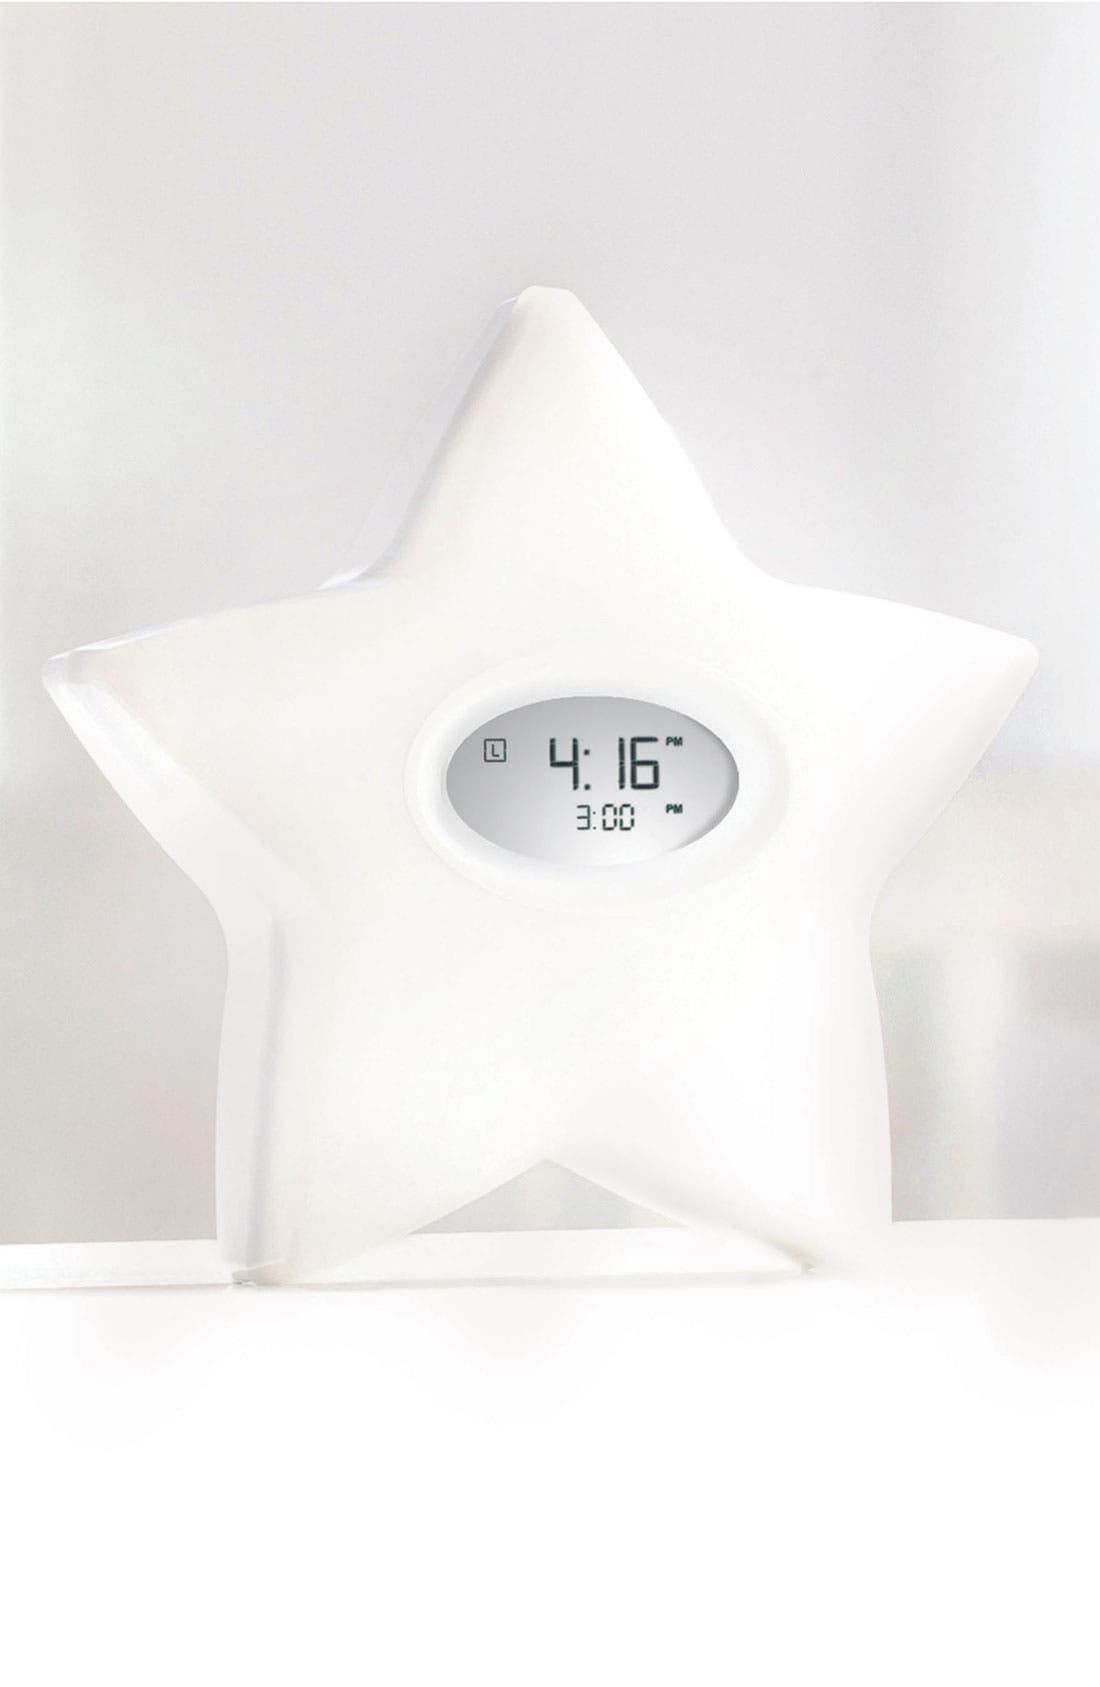 ADEN + ANAIS,                             'Serenity Star<sup>™</sup>' Electronic Feeding & Sleep System,                             Main thumbnail 1, color,                             100